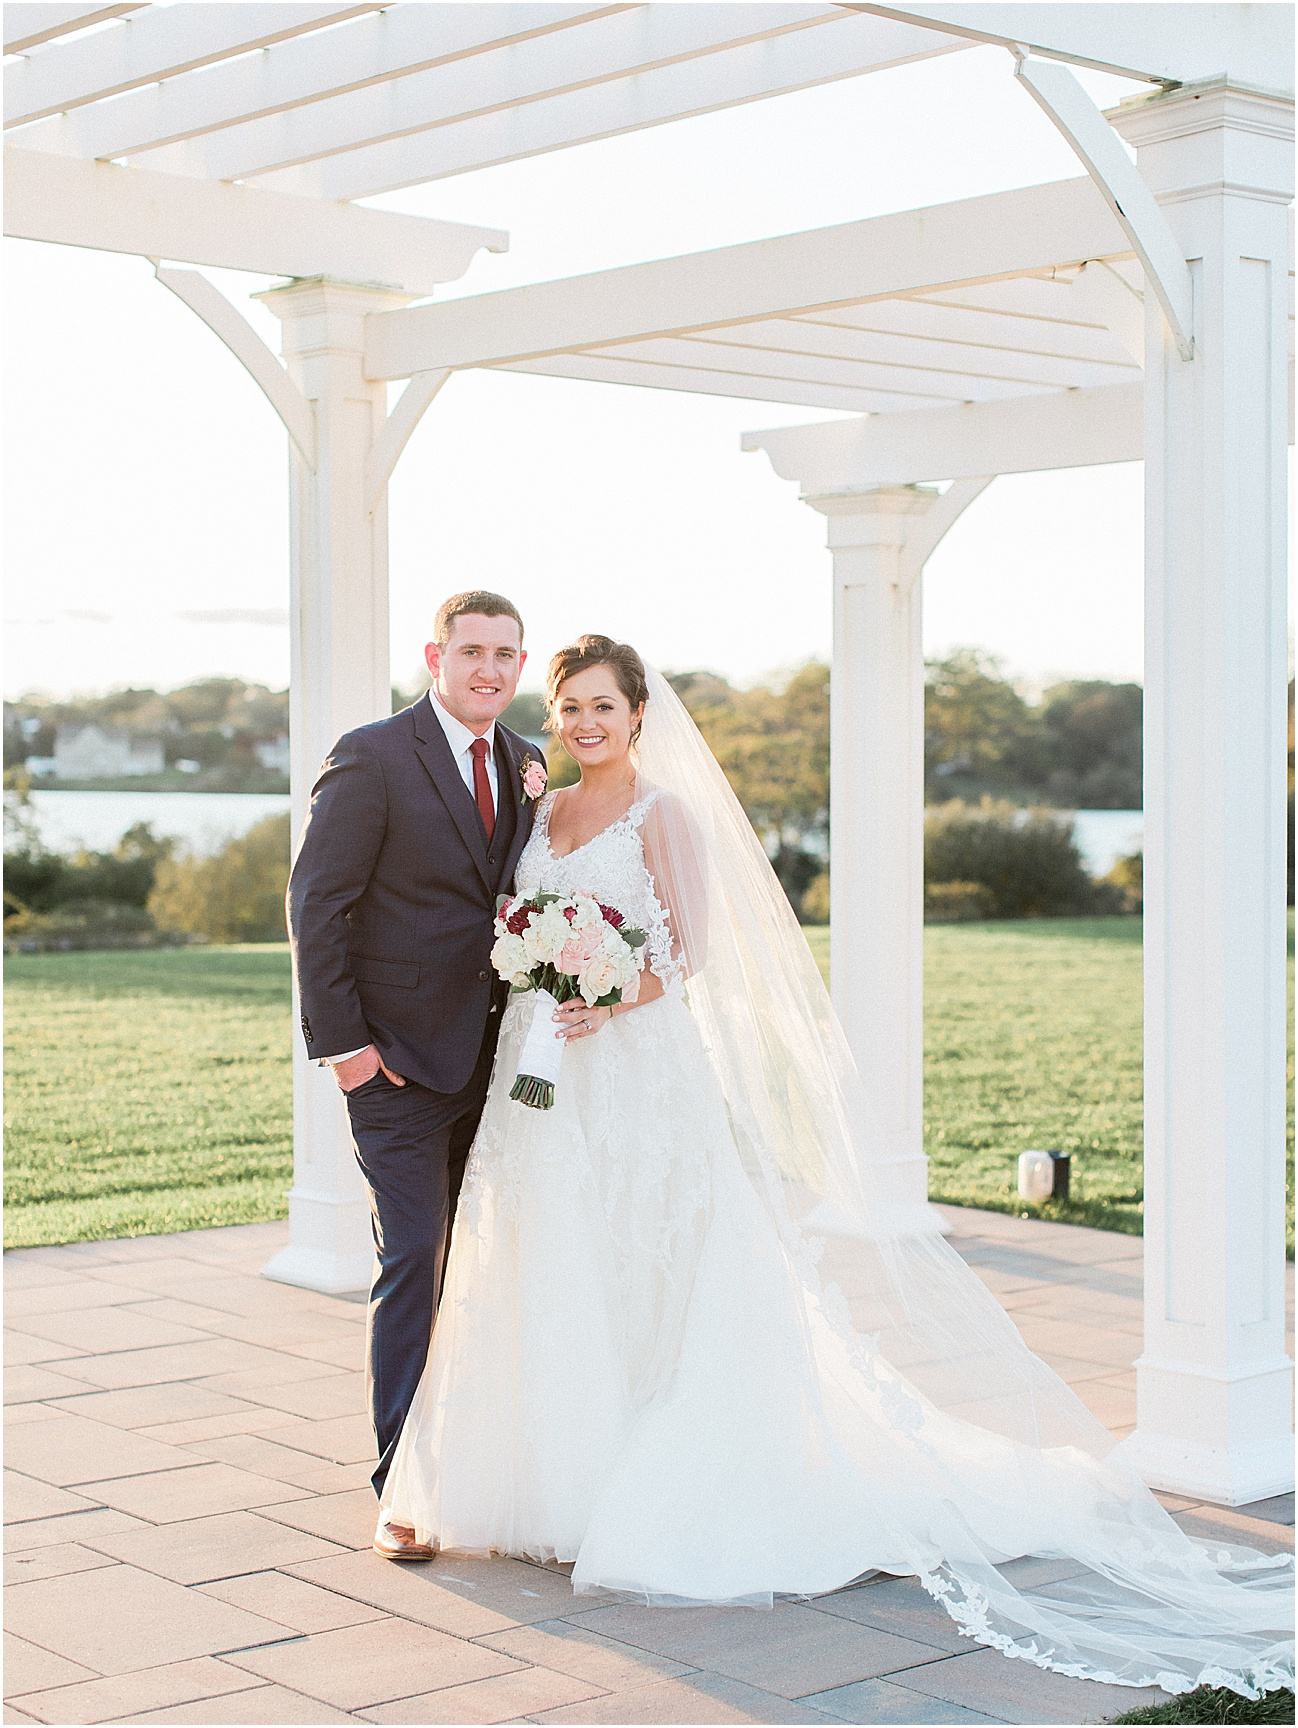 shannon_daniel_dan_atlantic_resort_saint_marys_st_mary_church_fall_newport_catholic_irish_cape_cod_boston_wedding_photographer_meredith_jane_photography_photo_1636.jpg